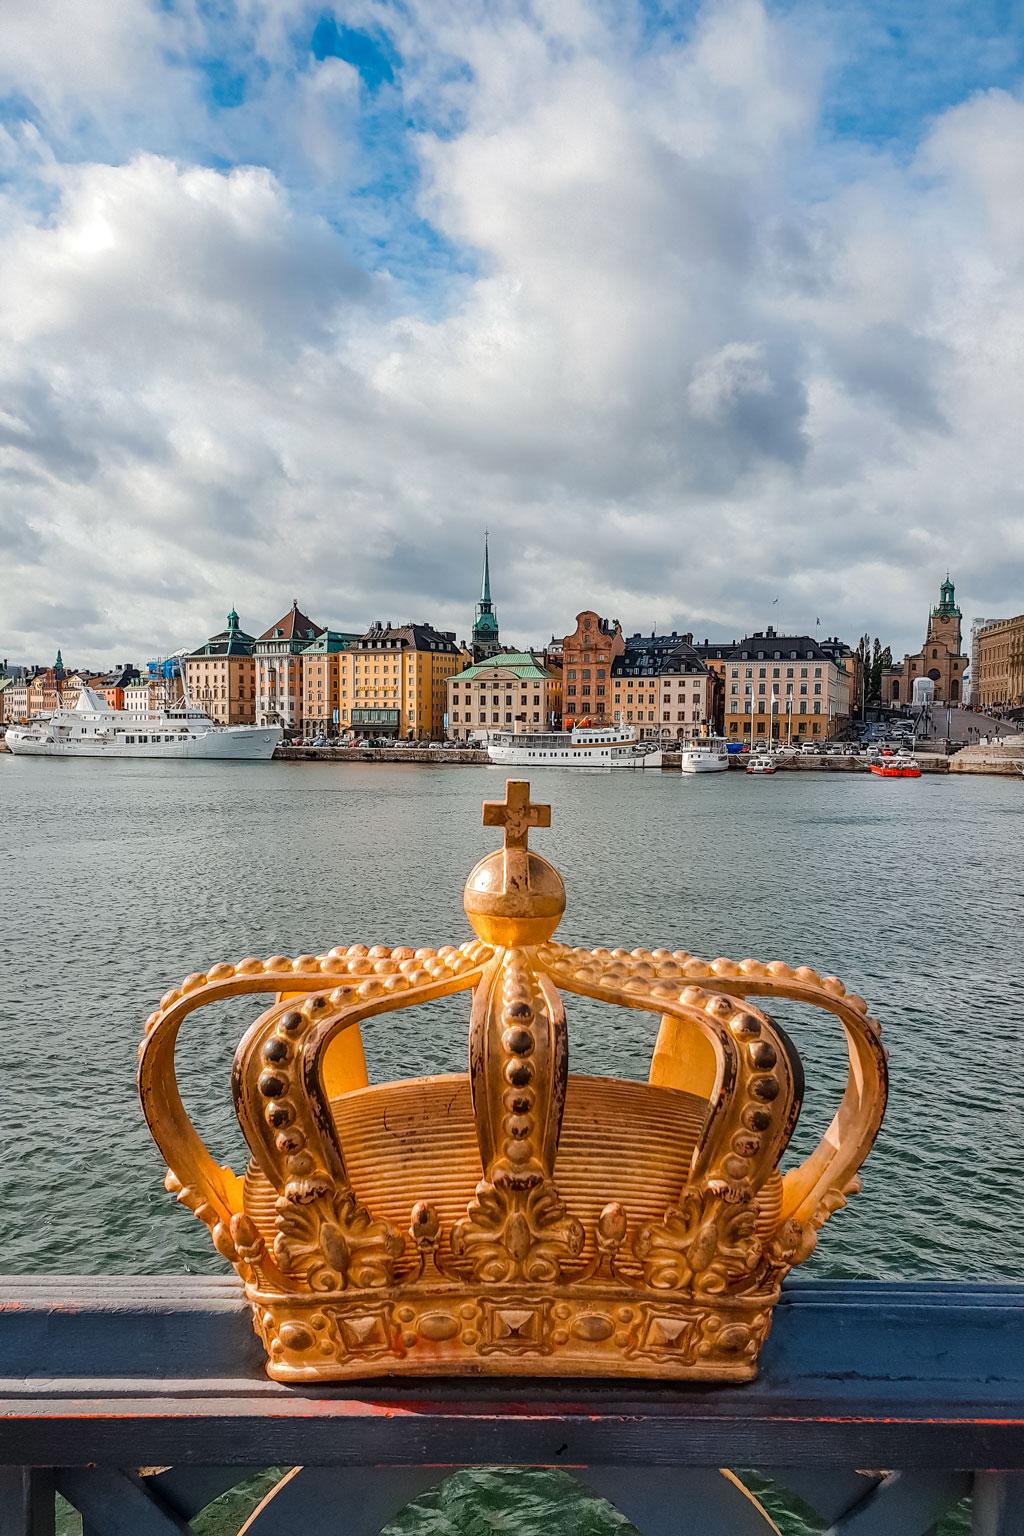 Golden Crown on the Skeppsholmen Bridge